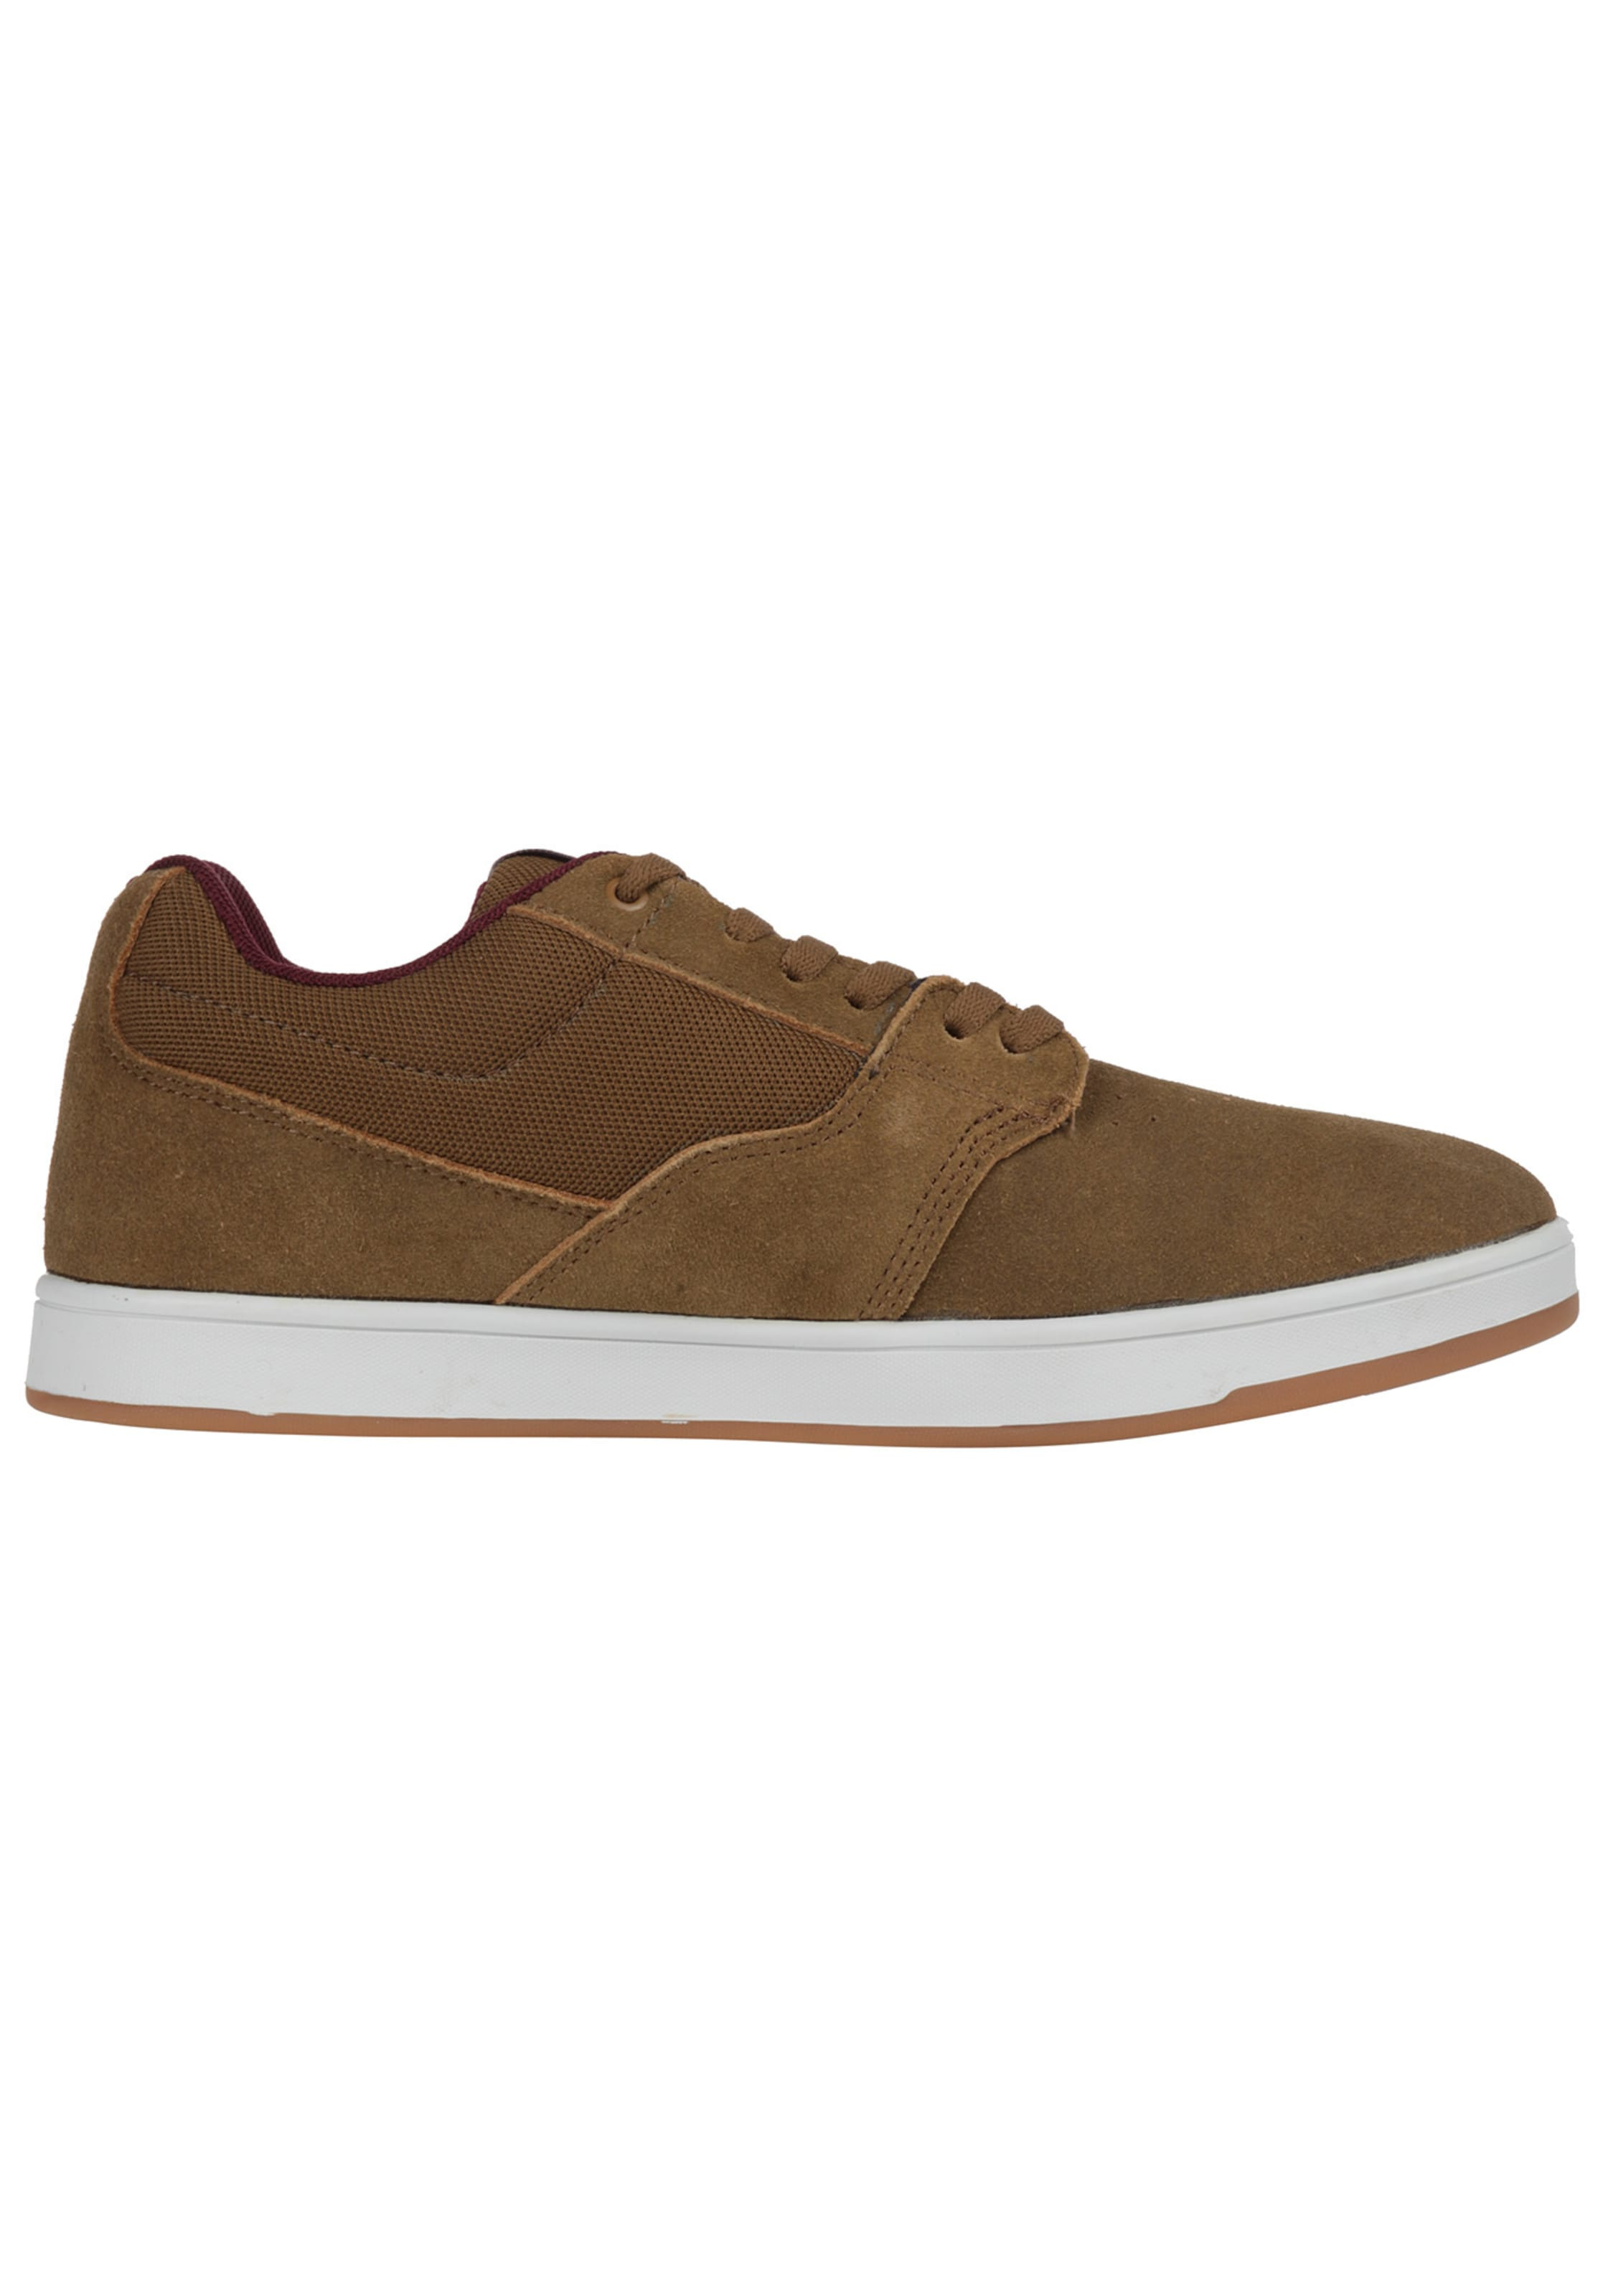 'granite' Sneaker 'granite' Braun Element Element In Sneaker fgY6y7b